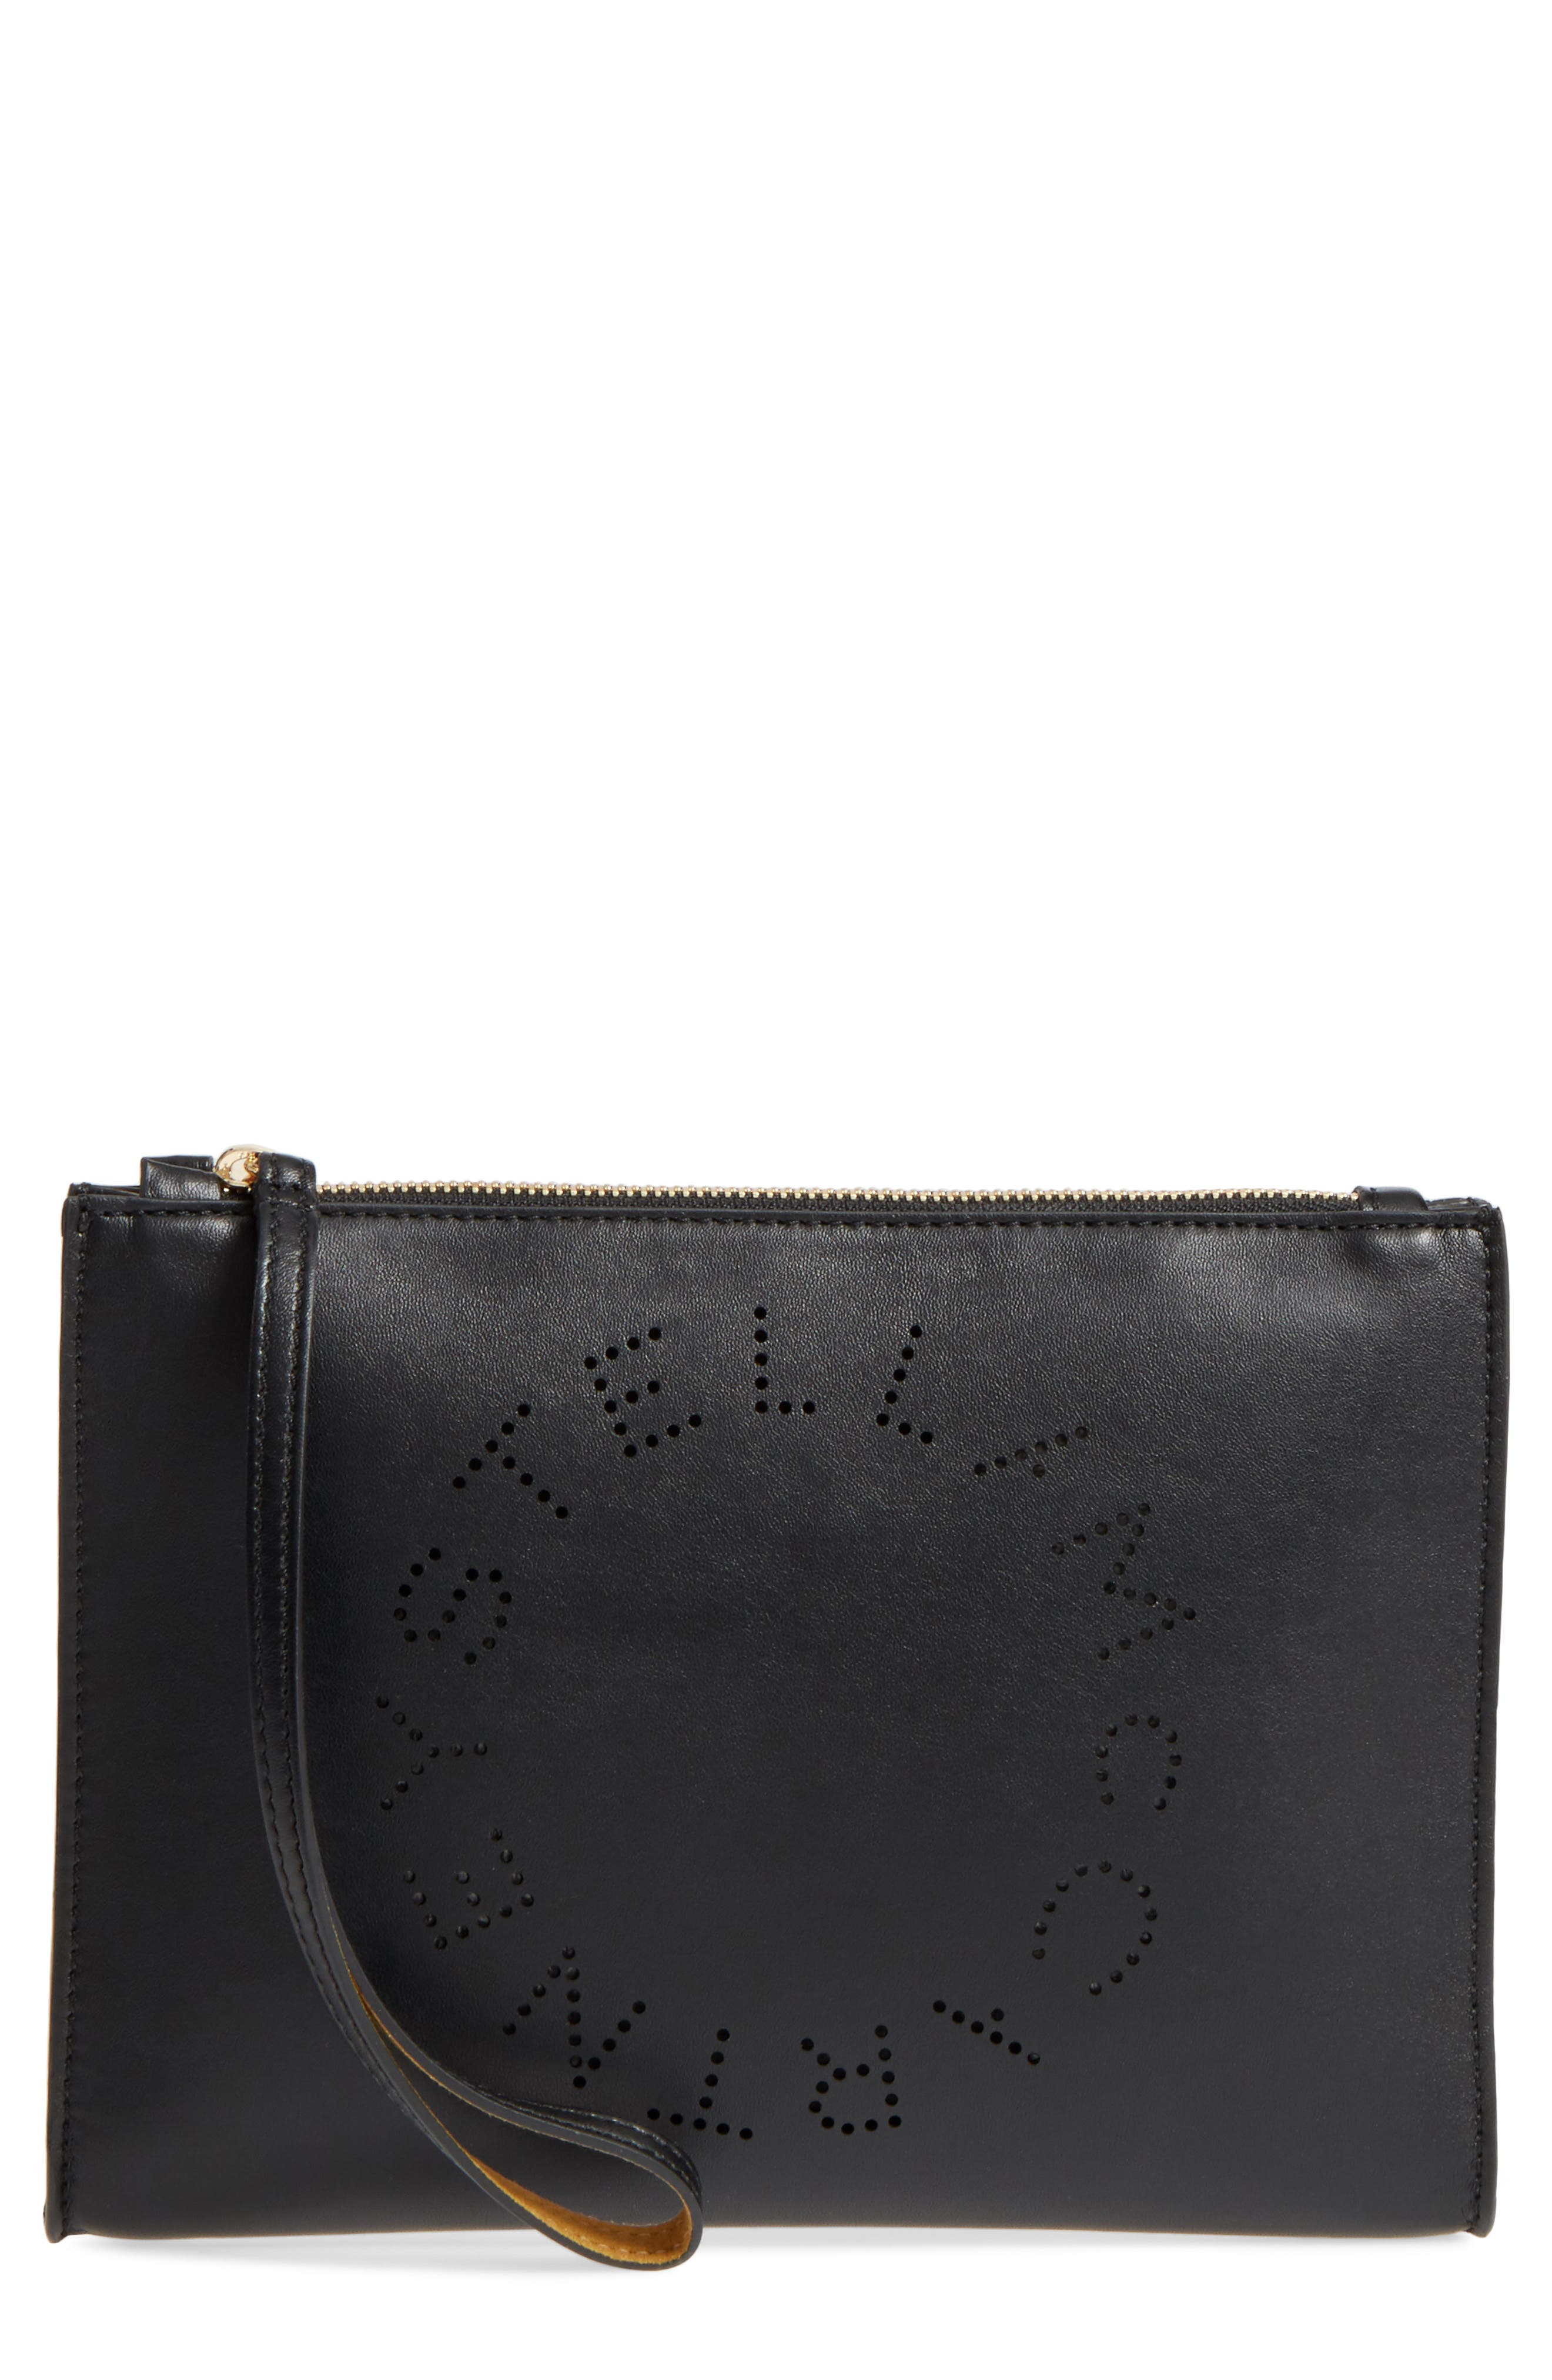 Alter Faux Nappa Leather Wristlet Clutch,                         Main,                         color, BLACK